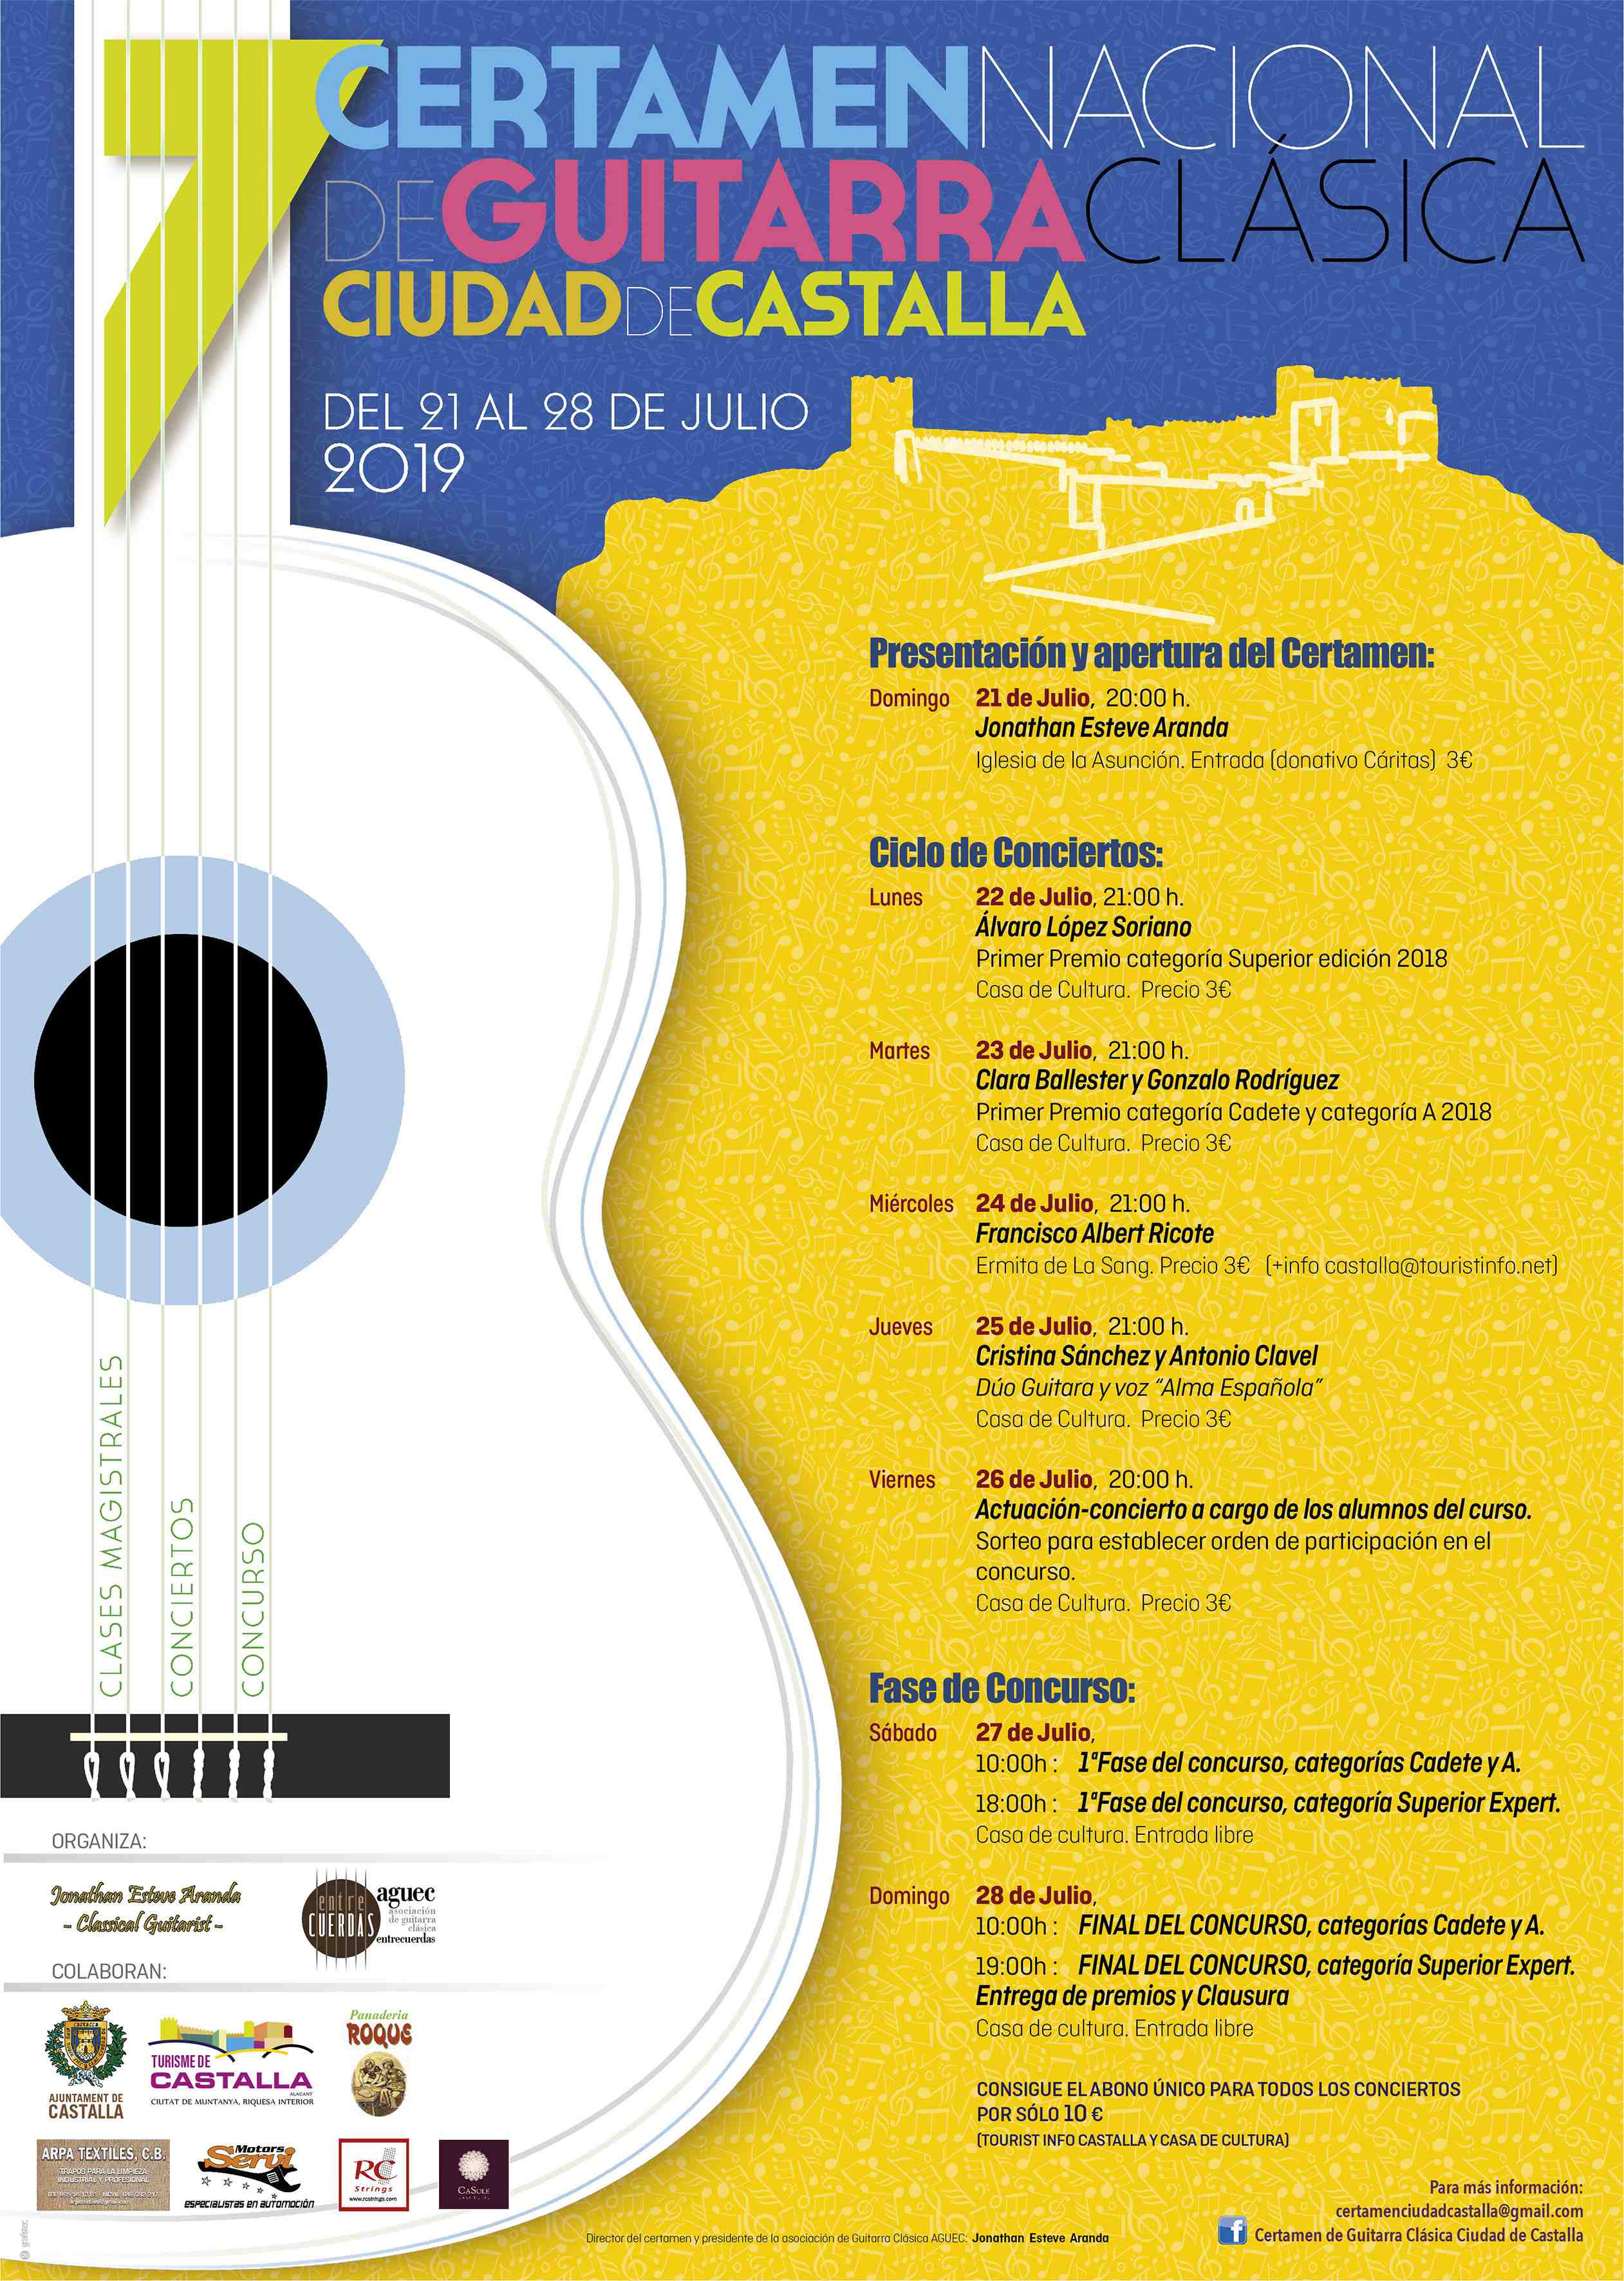 Del 21 al 28 de julio, séptimo Certamen Nacional de Guitarra Clásica 'Ciudad de Castalla'